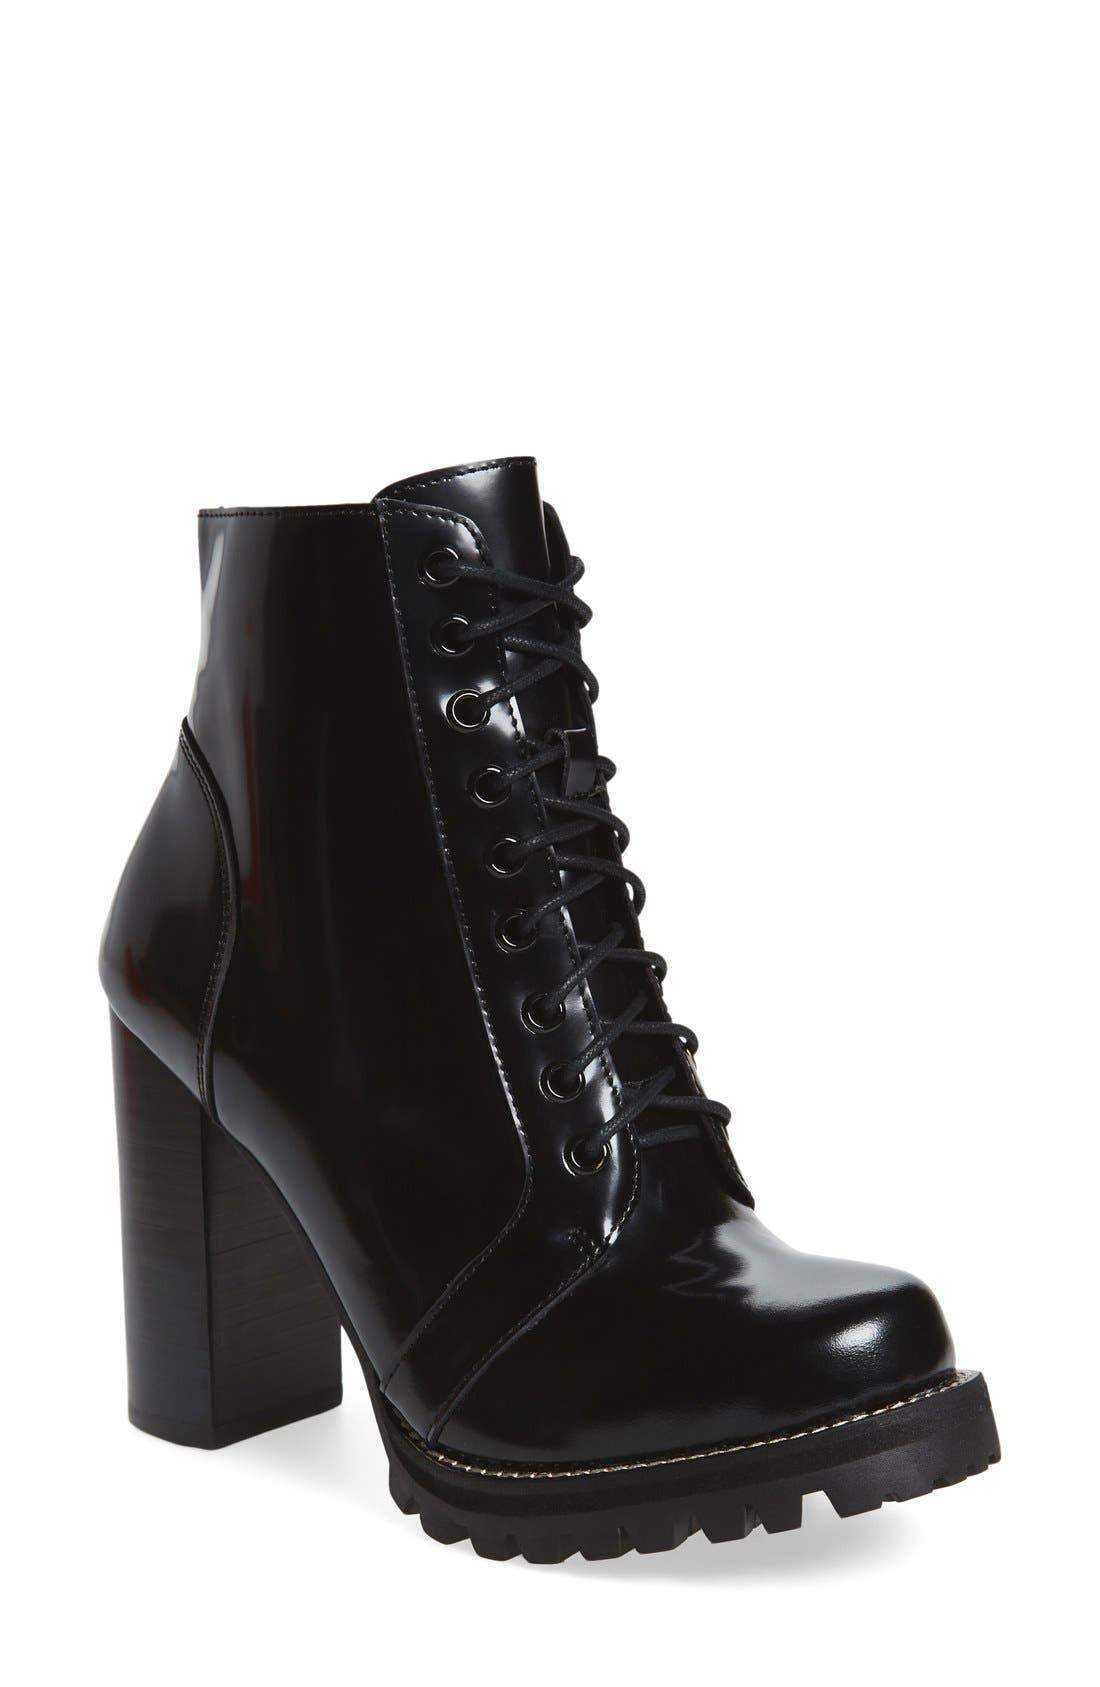 Main Image - Jeffrey Campbell 'Legion' High Heel Boot (Women)